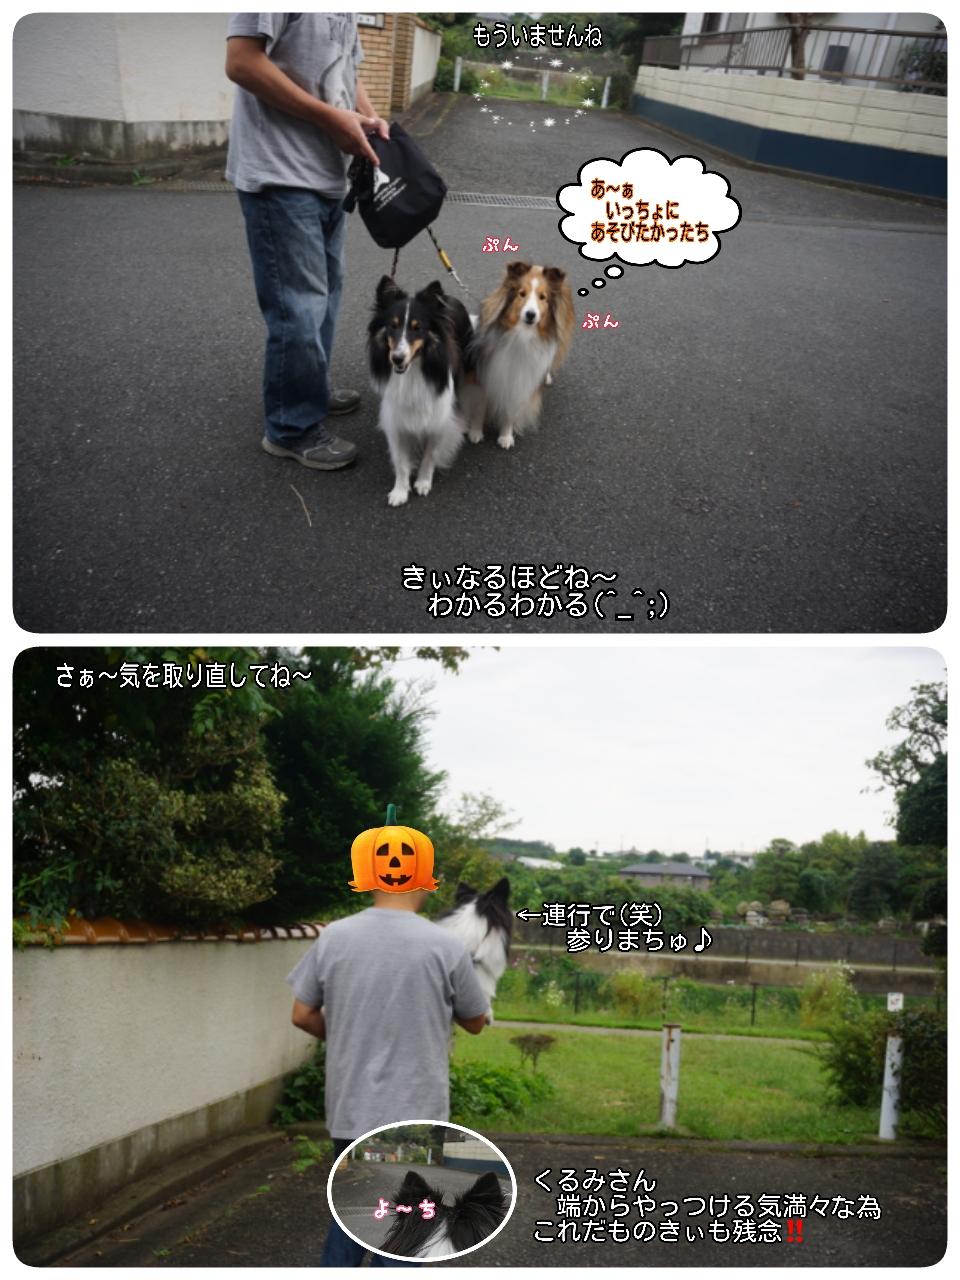 16-10-08-04-11-39-683_deco.jpg